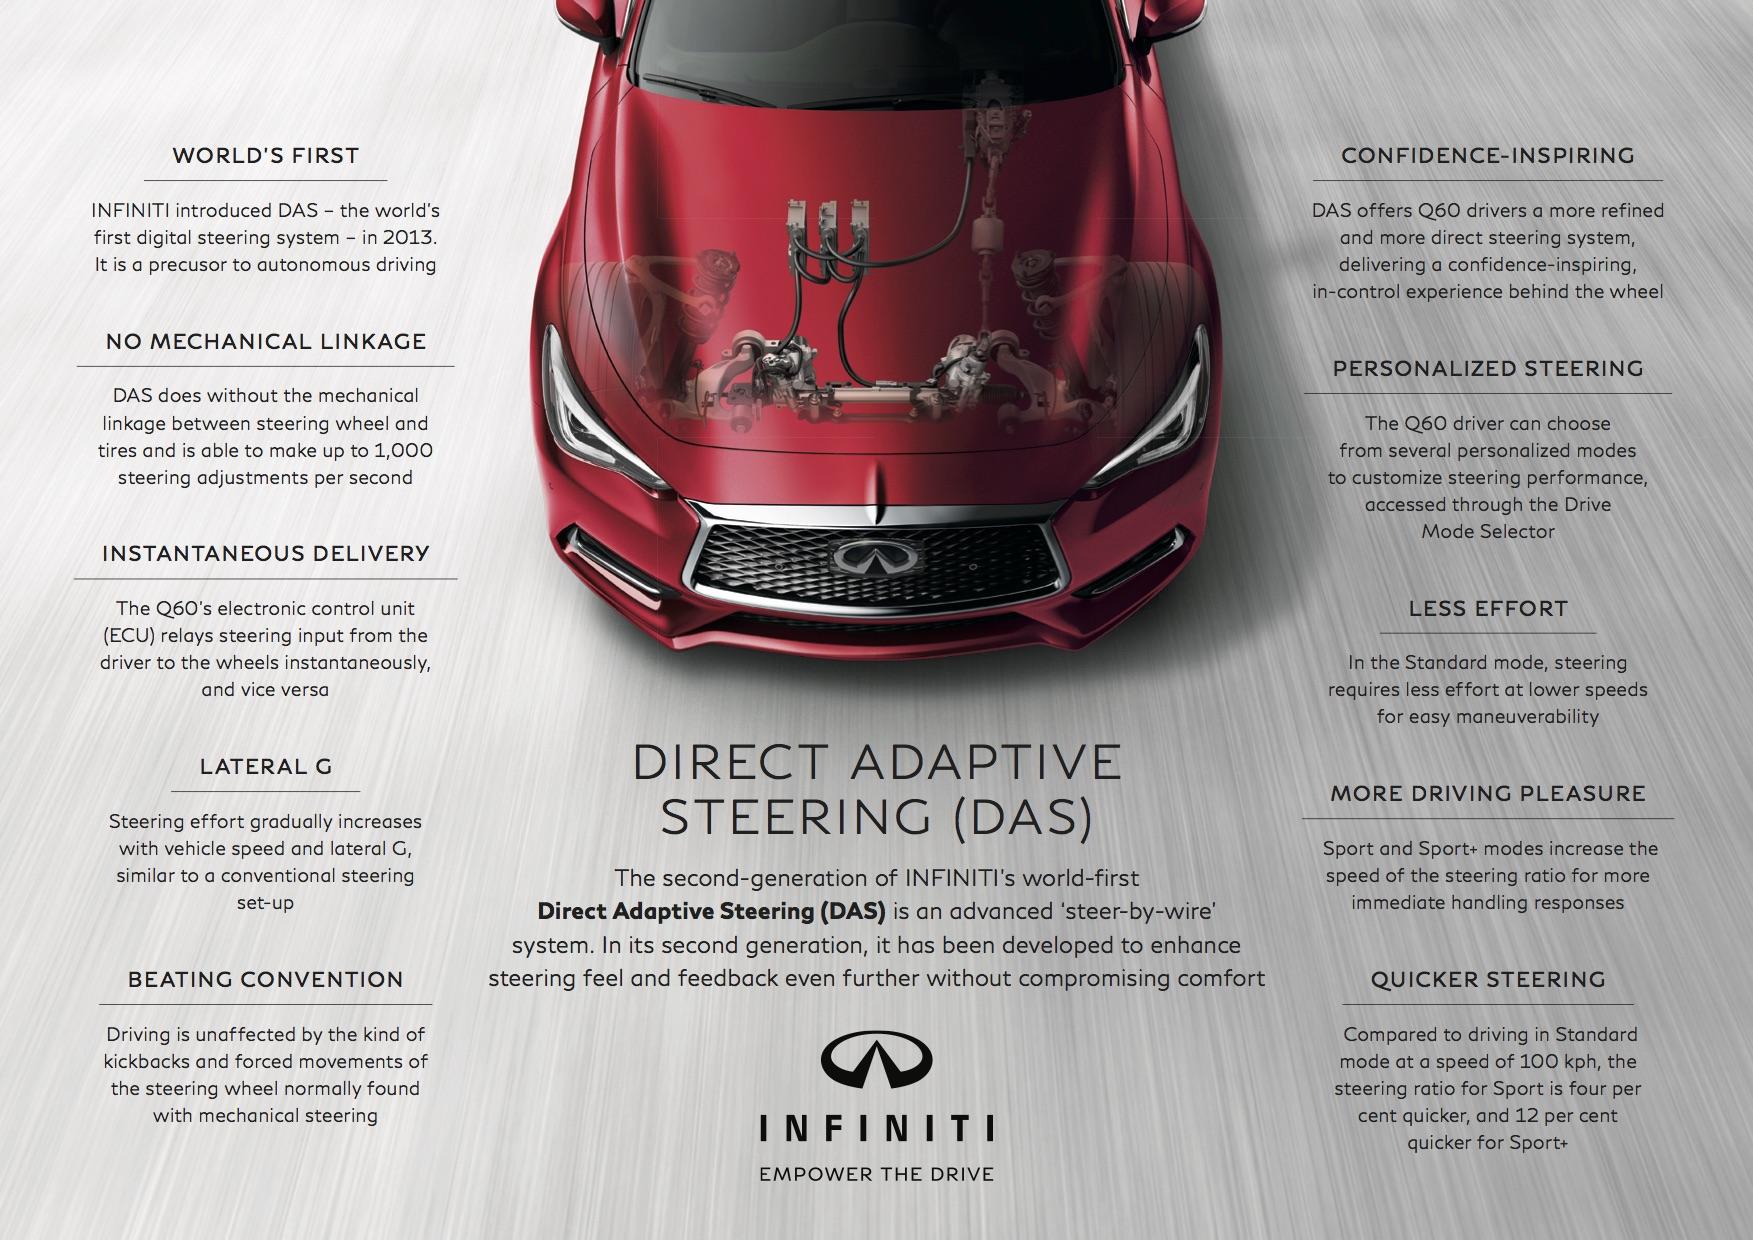 Infiniti Direct Adaptive Steering Infographic